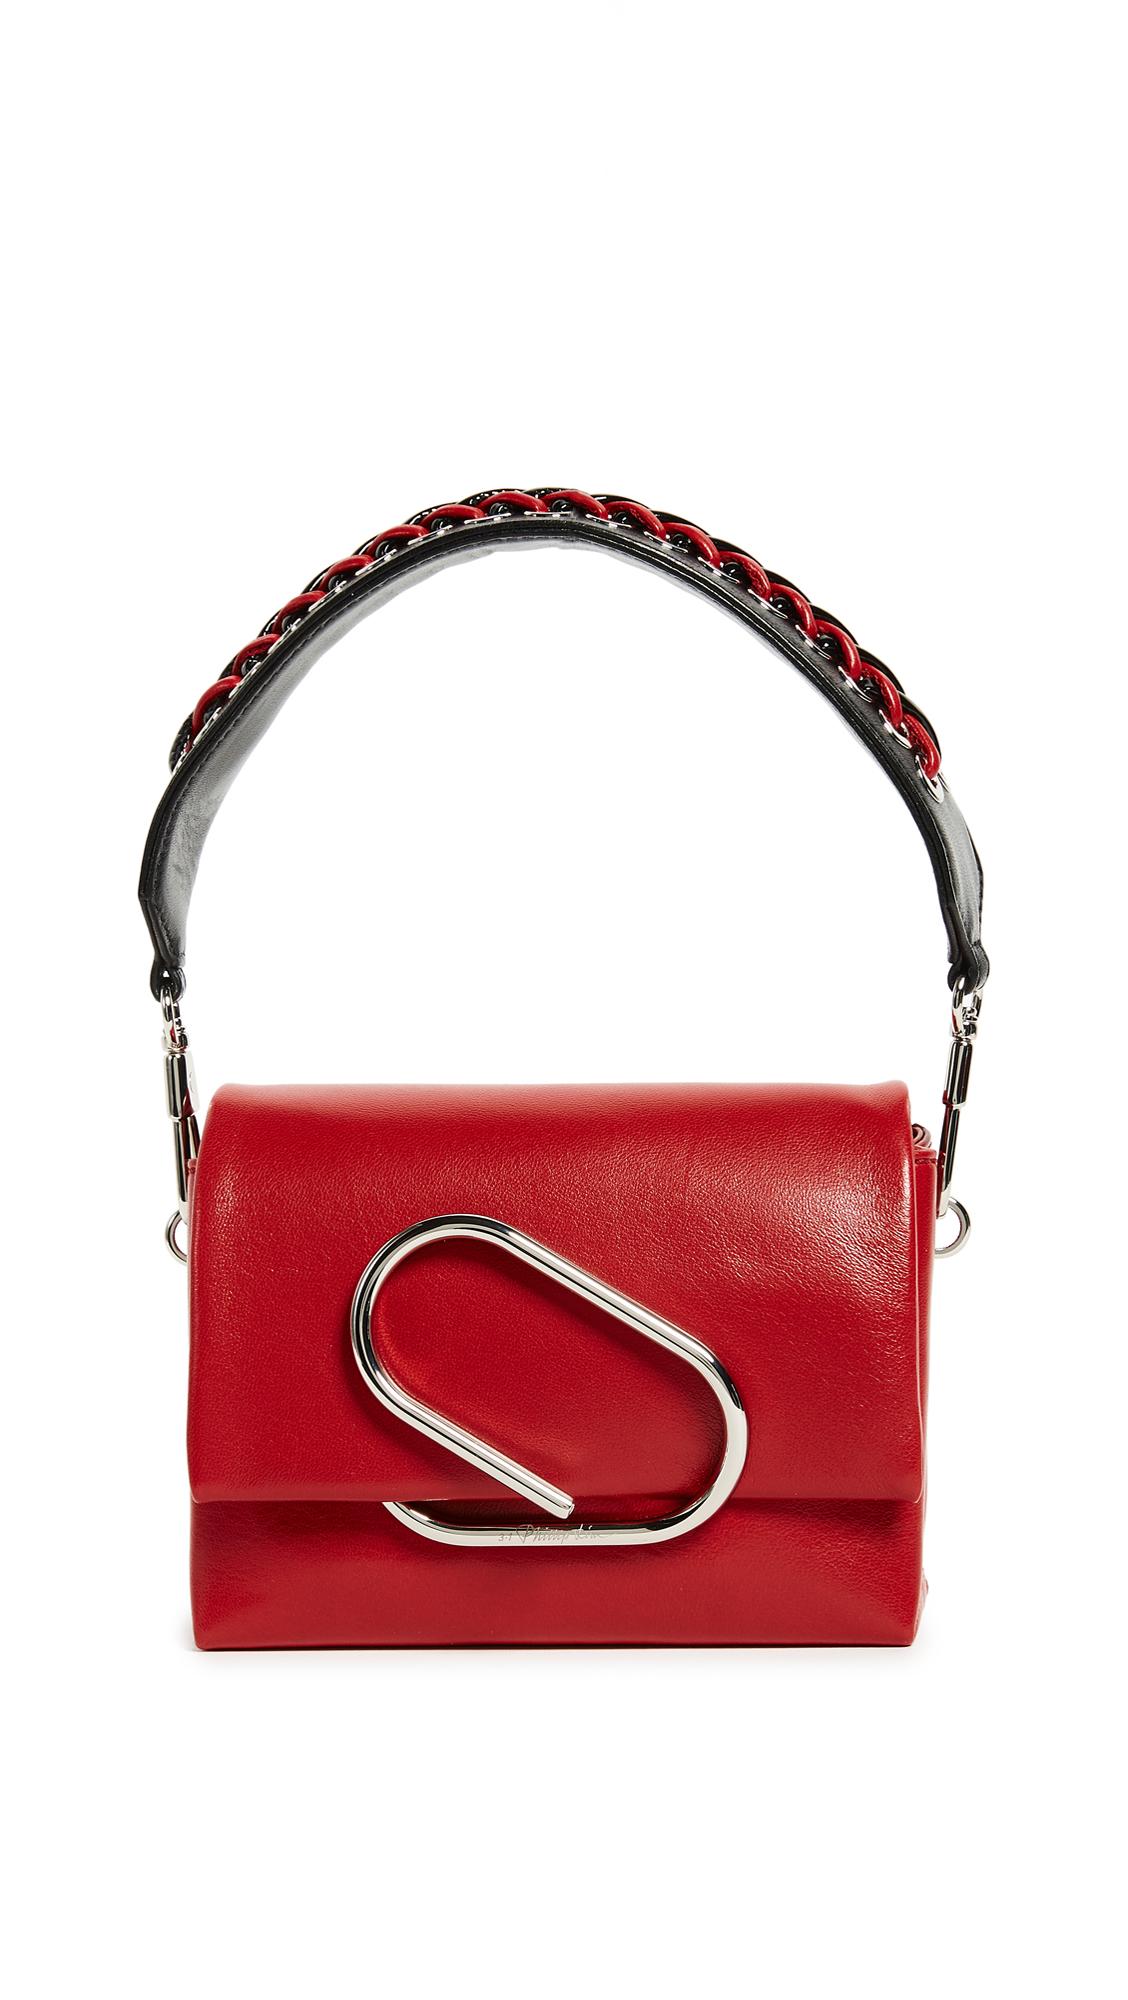 3.1 Phillip Lim Alix Micro Sport Cross Body Bag - Scarlet